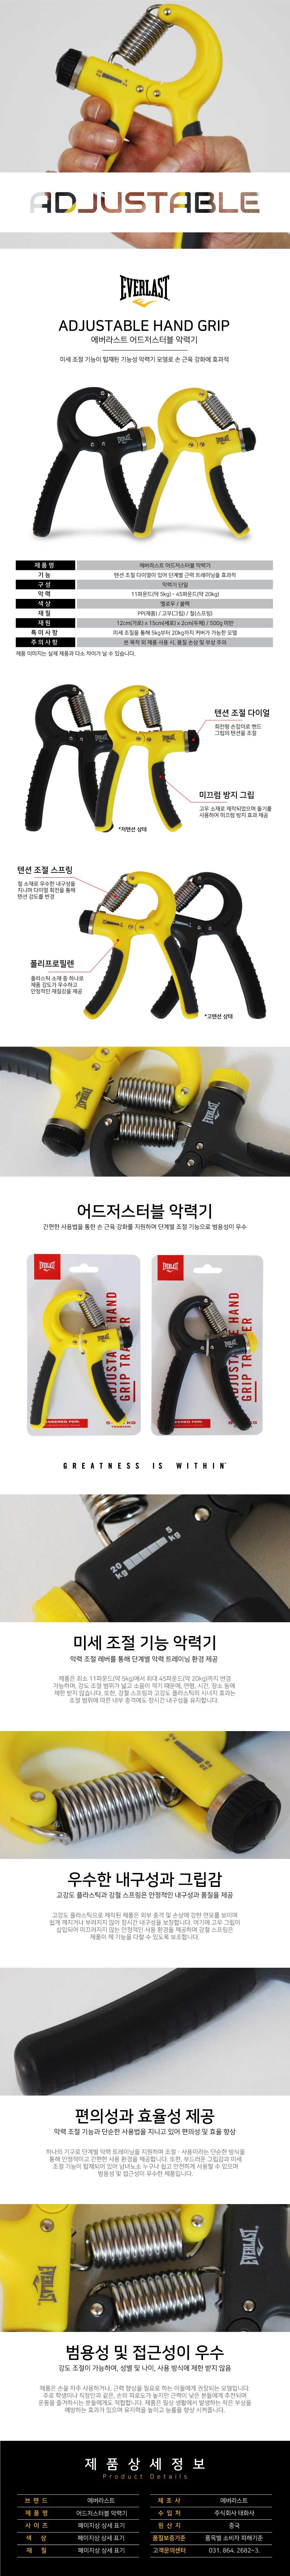 Black for sale online Everlast Adjustable Power Hand Grips